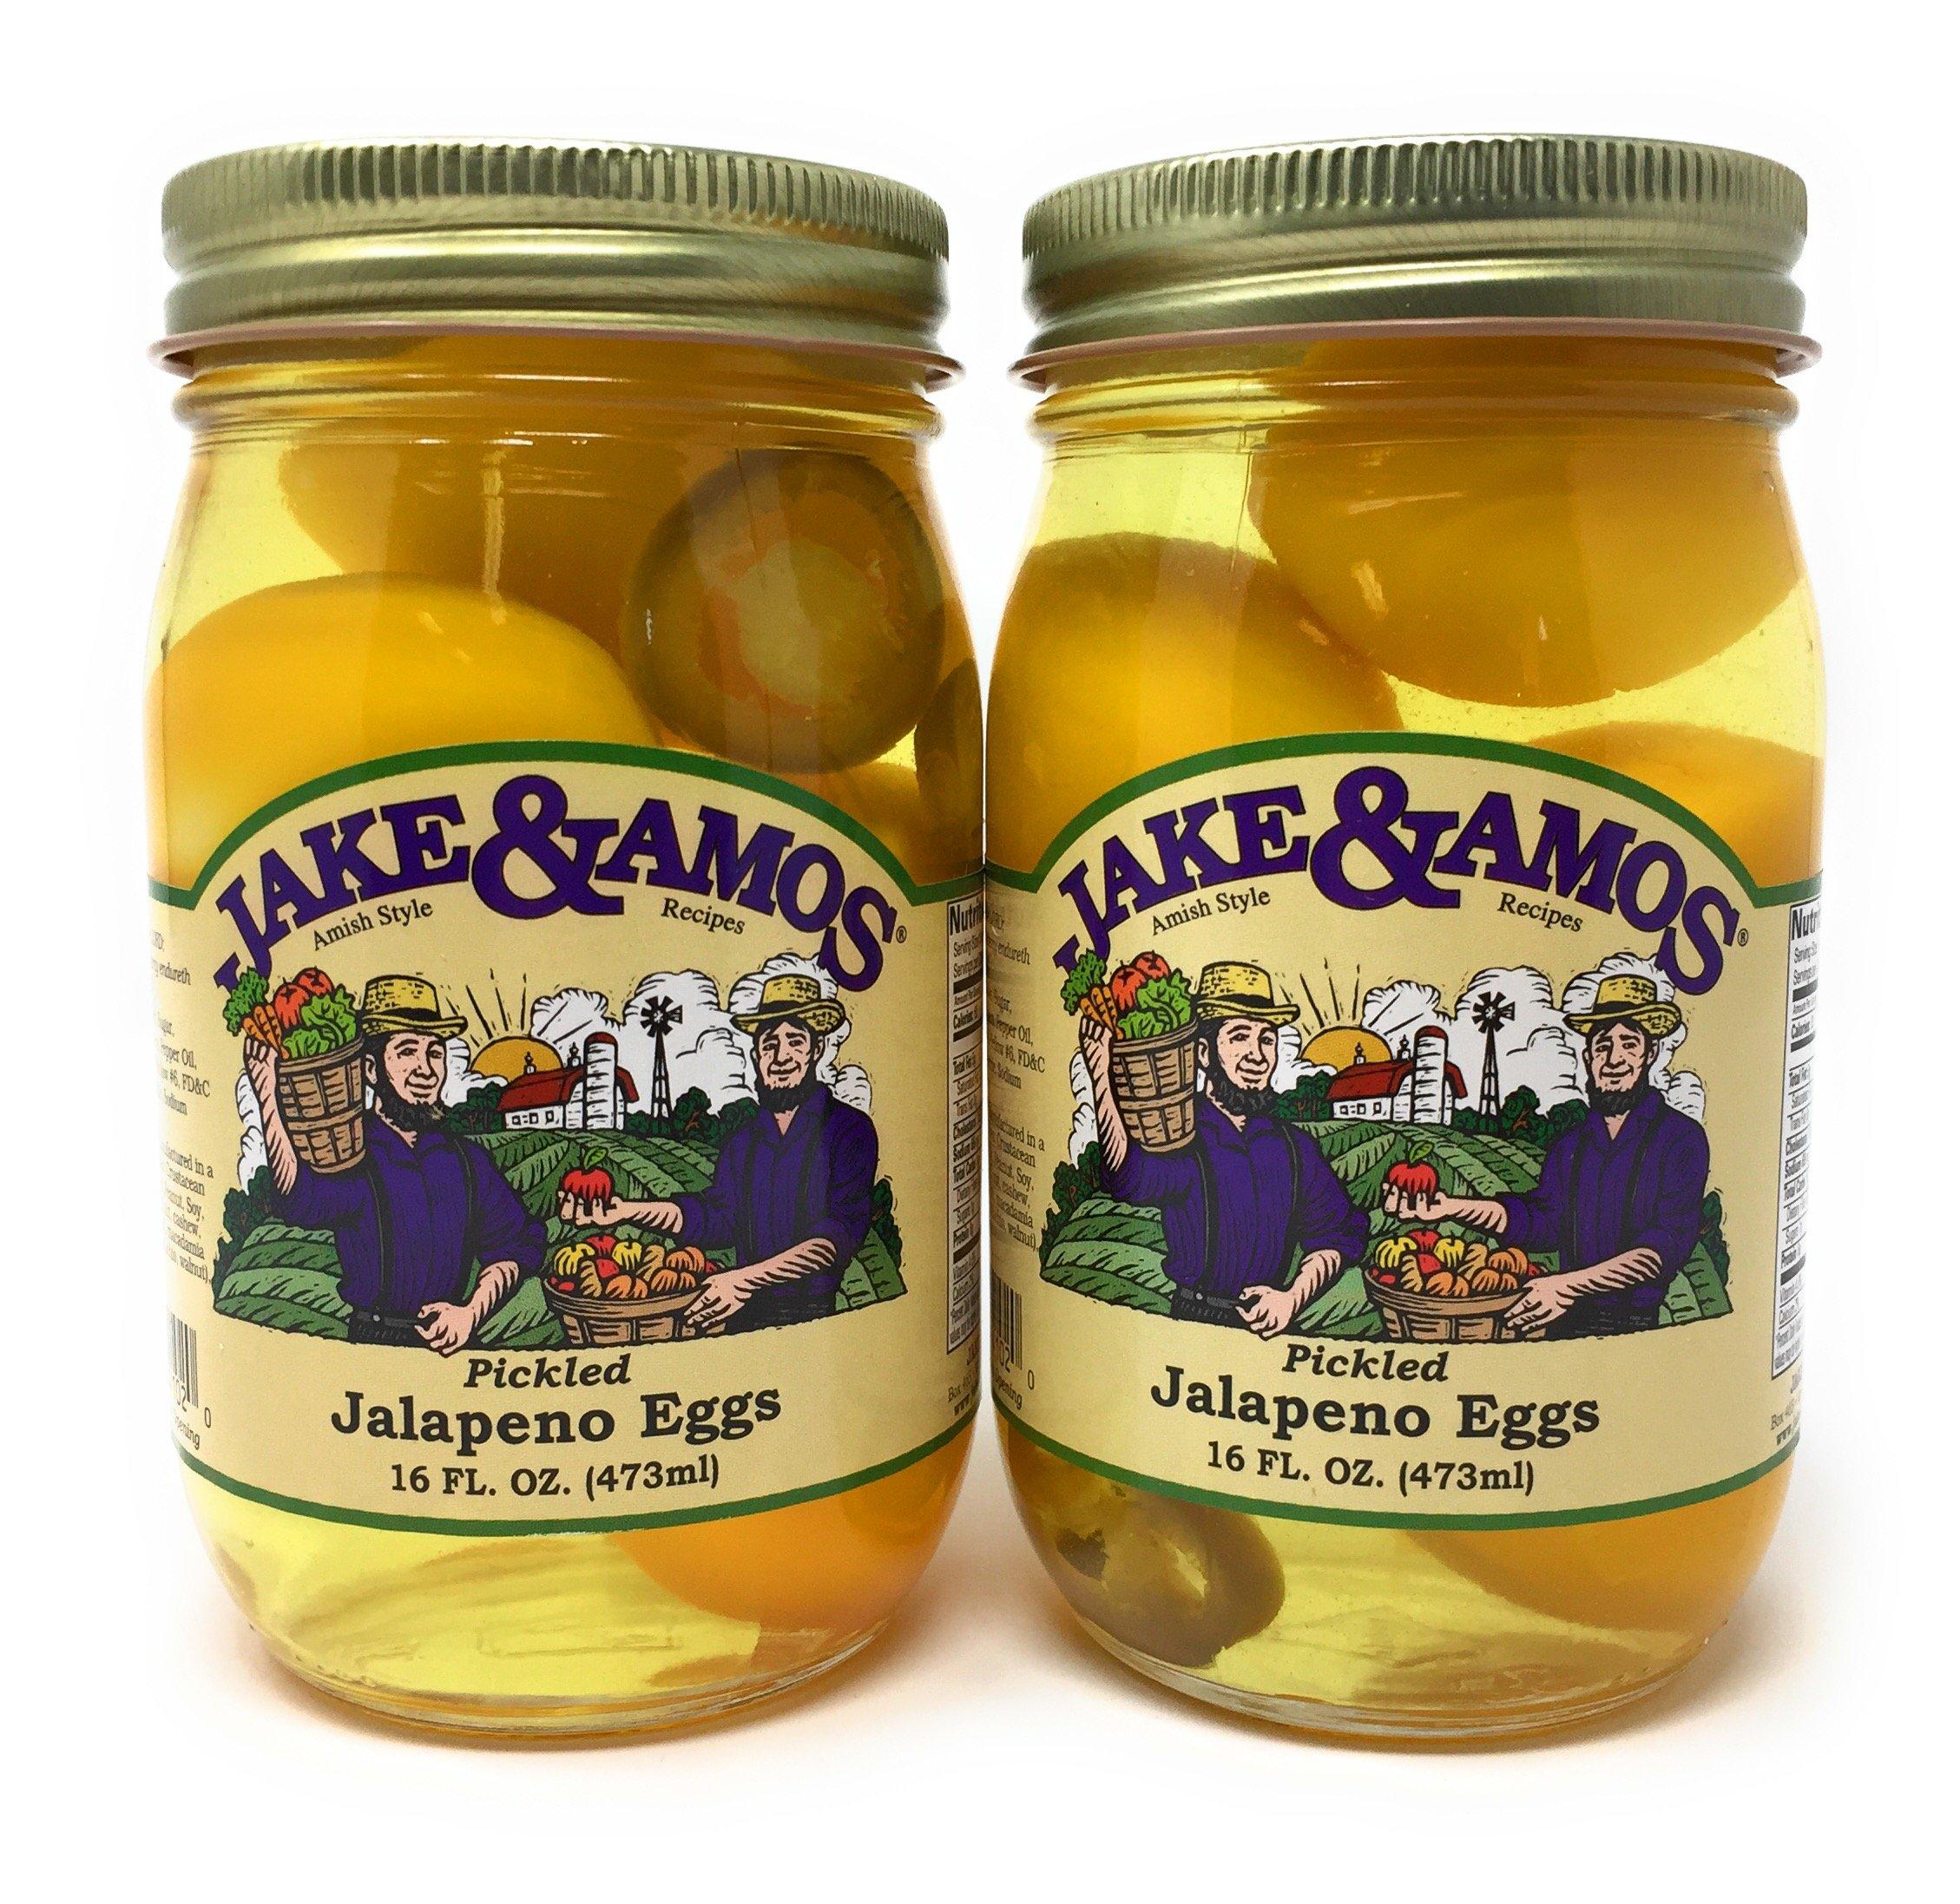 Jake & Amos - Pickled Jalapeno Eggs / 2 - 16 Oz. Jars